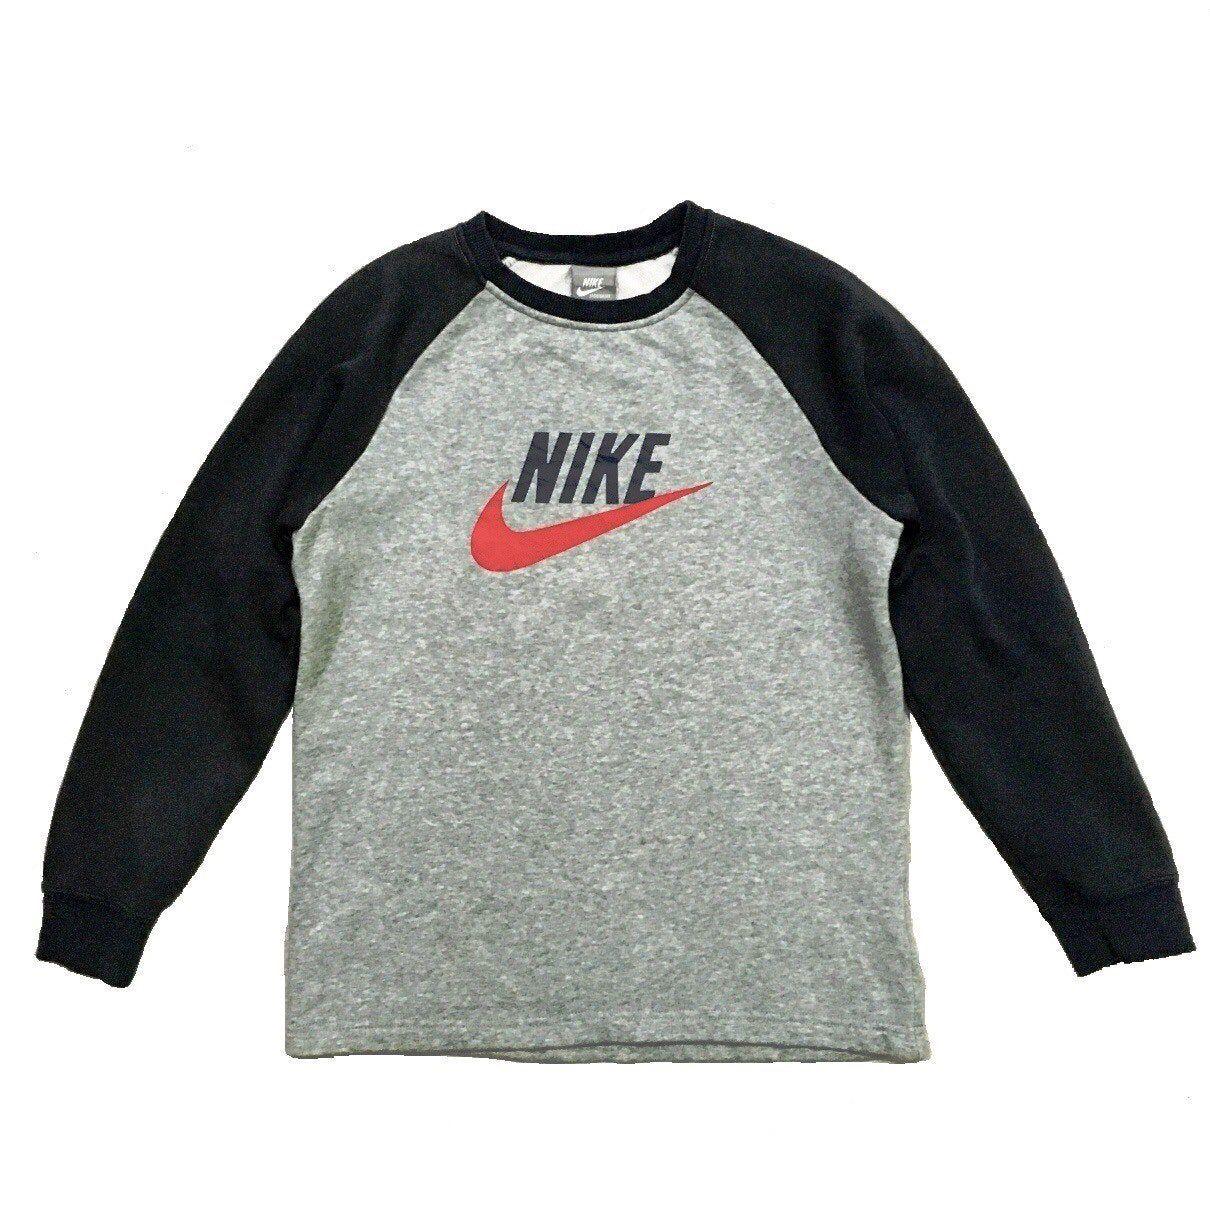 Excited To Share This Item From My Etsy Shop Nike Swoosh Big Logo Raglan Sweatshirt Women S S M Sweatshirts Raglan Sweatshirts Sweatshirts Women [ 1210 x 1210 Pixel ]